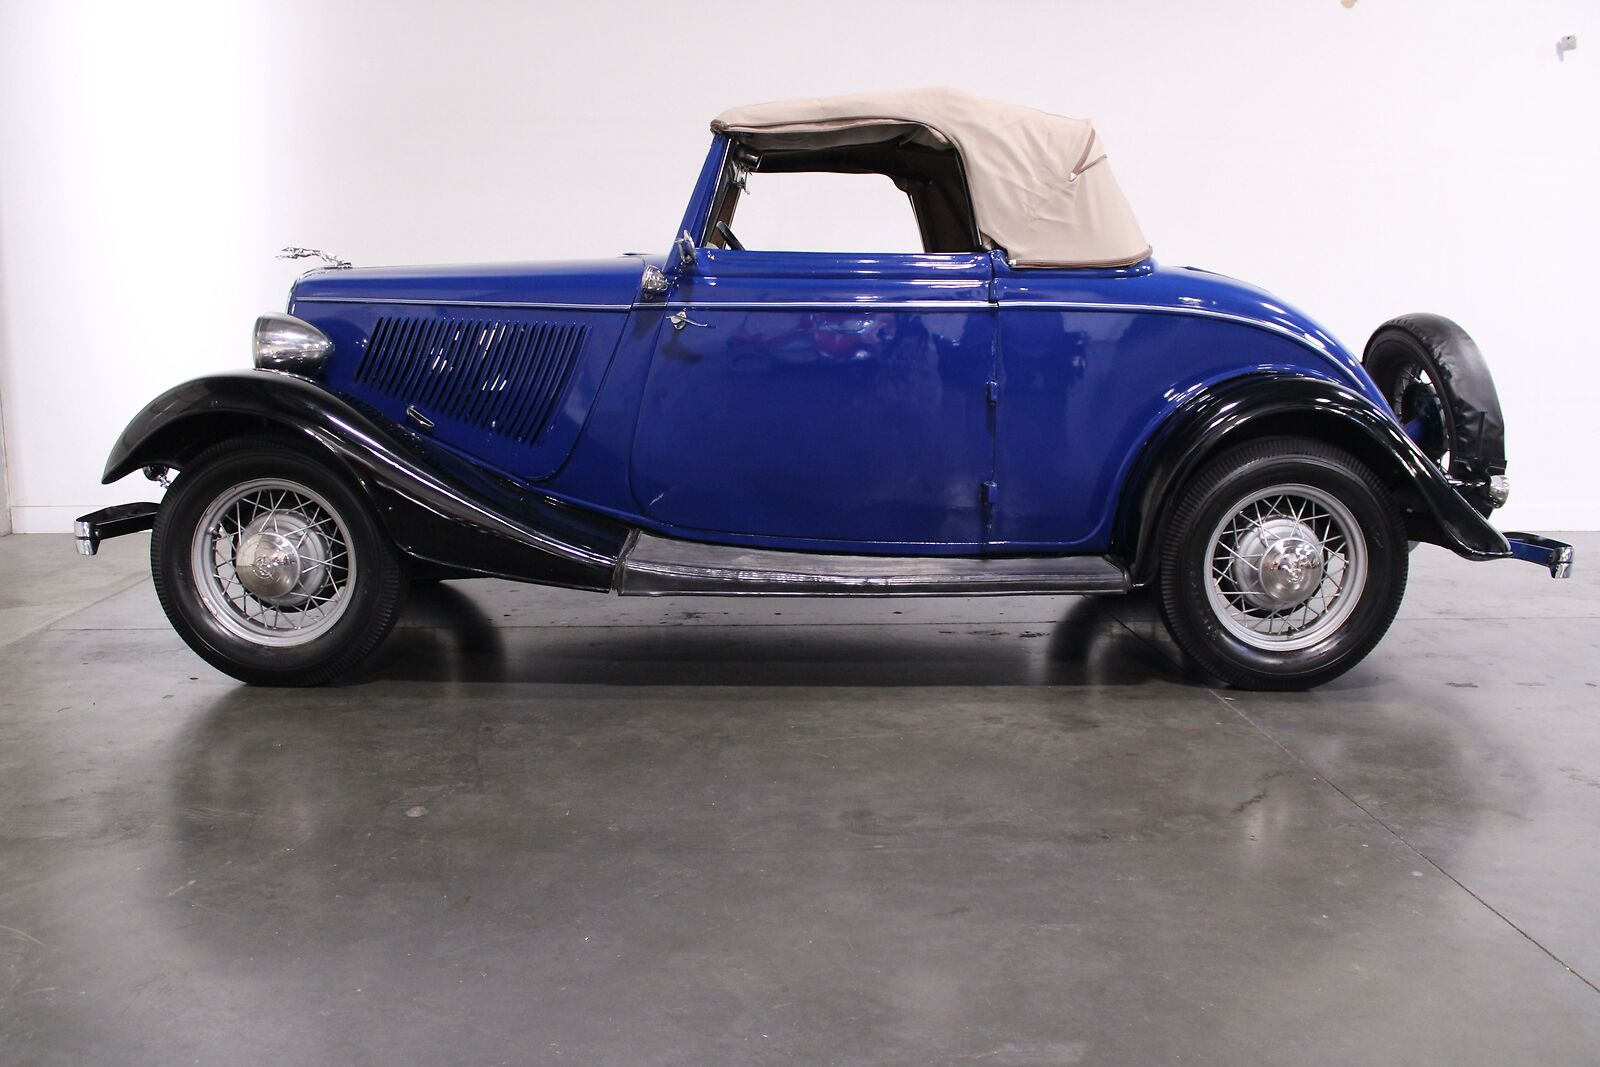 1933 Ford  Flathead V-8 Manual Convertible  Blue